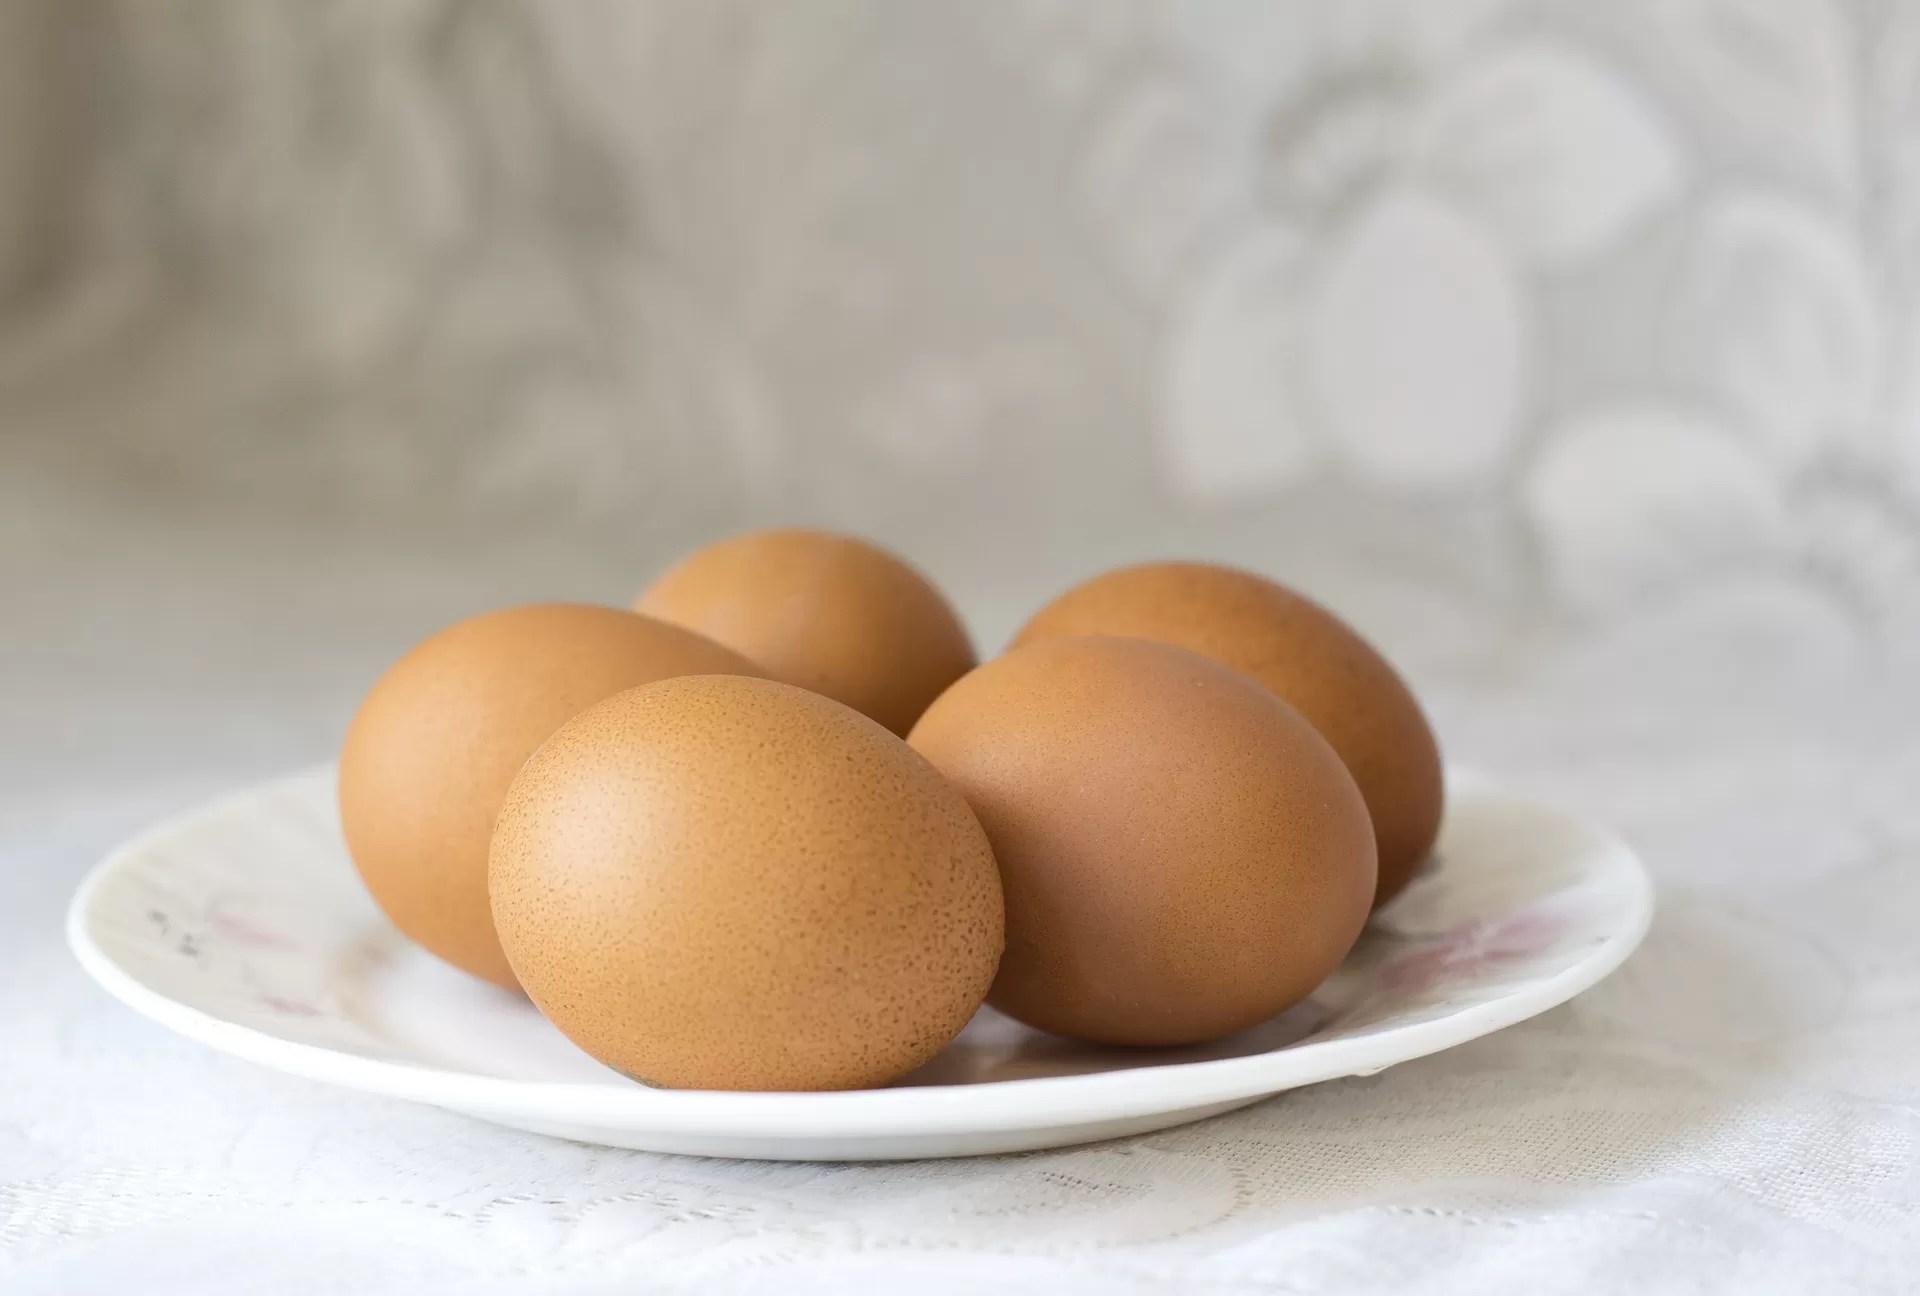 Egg coffee americano